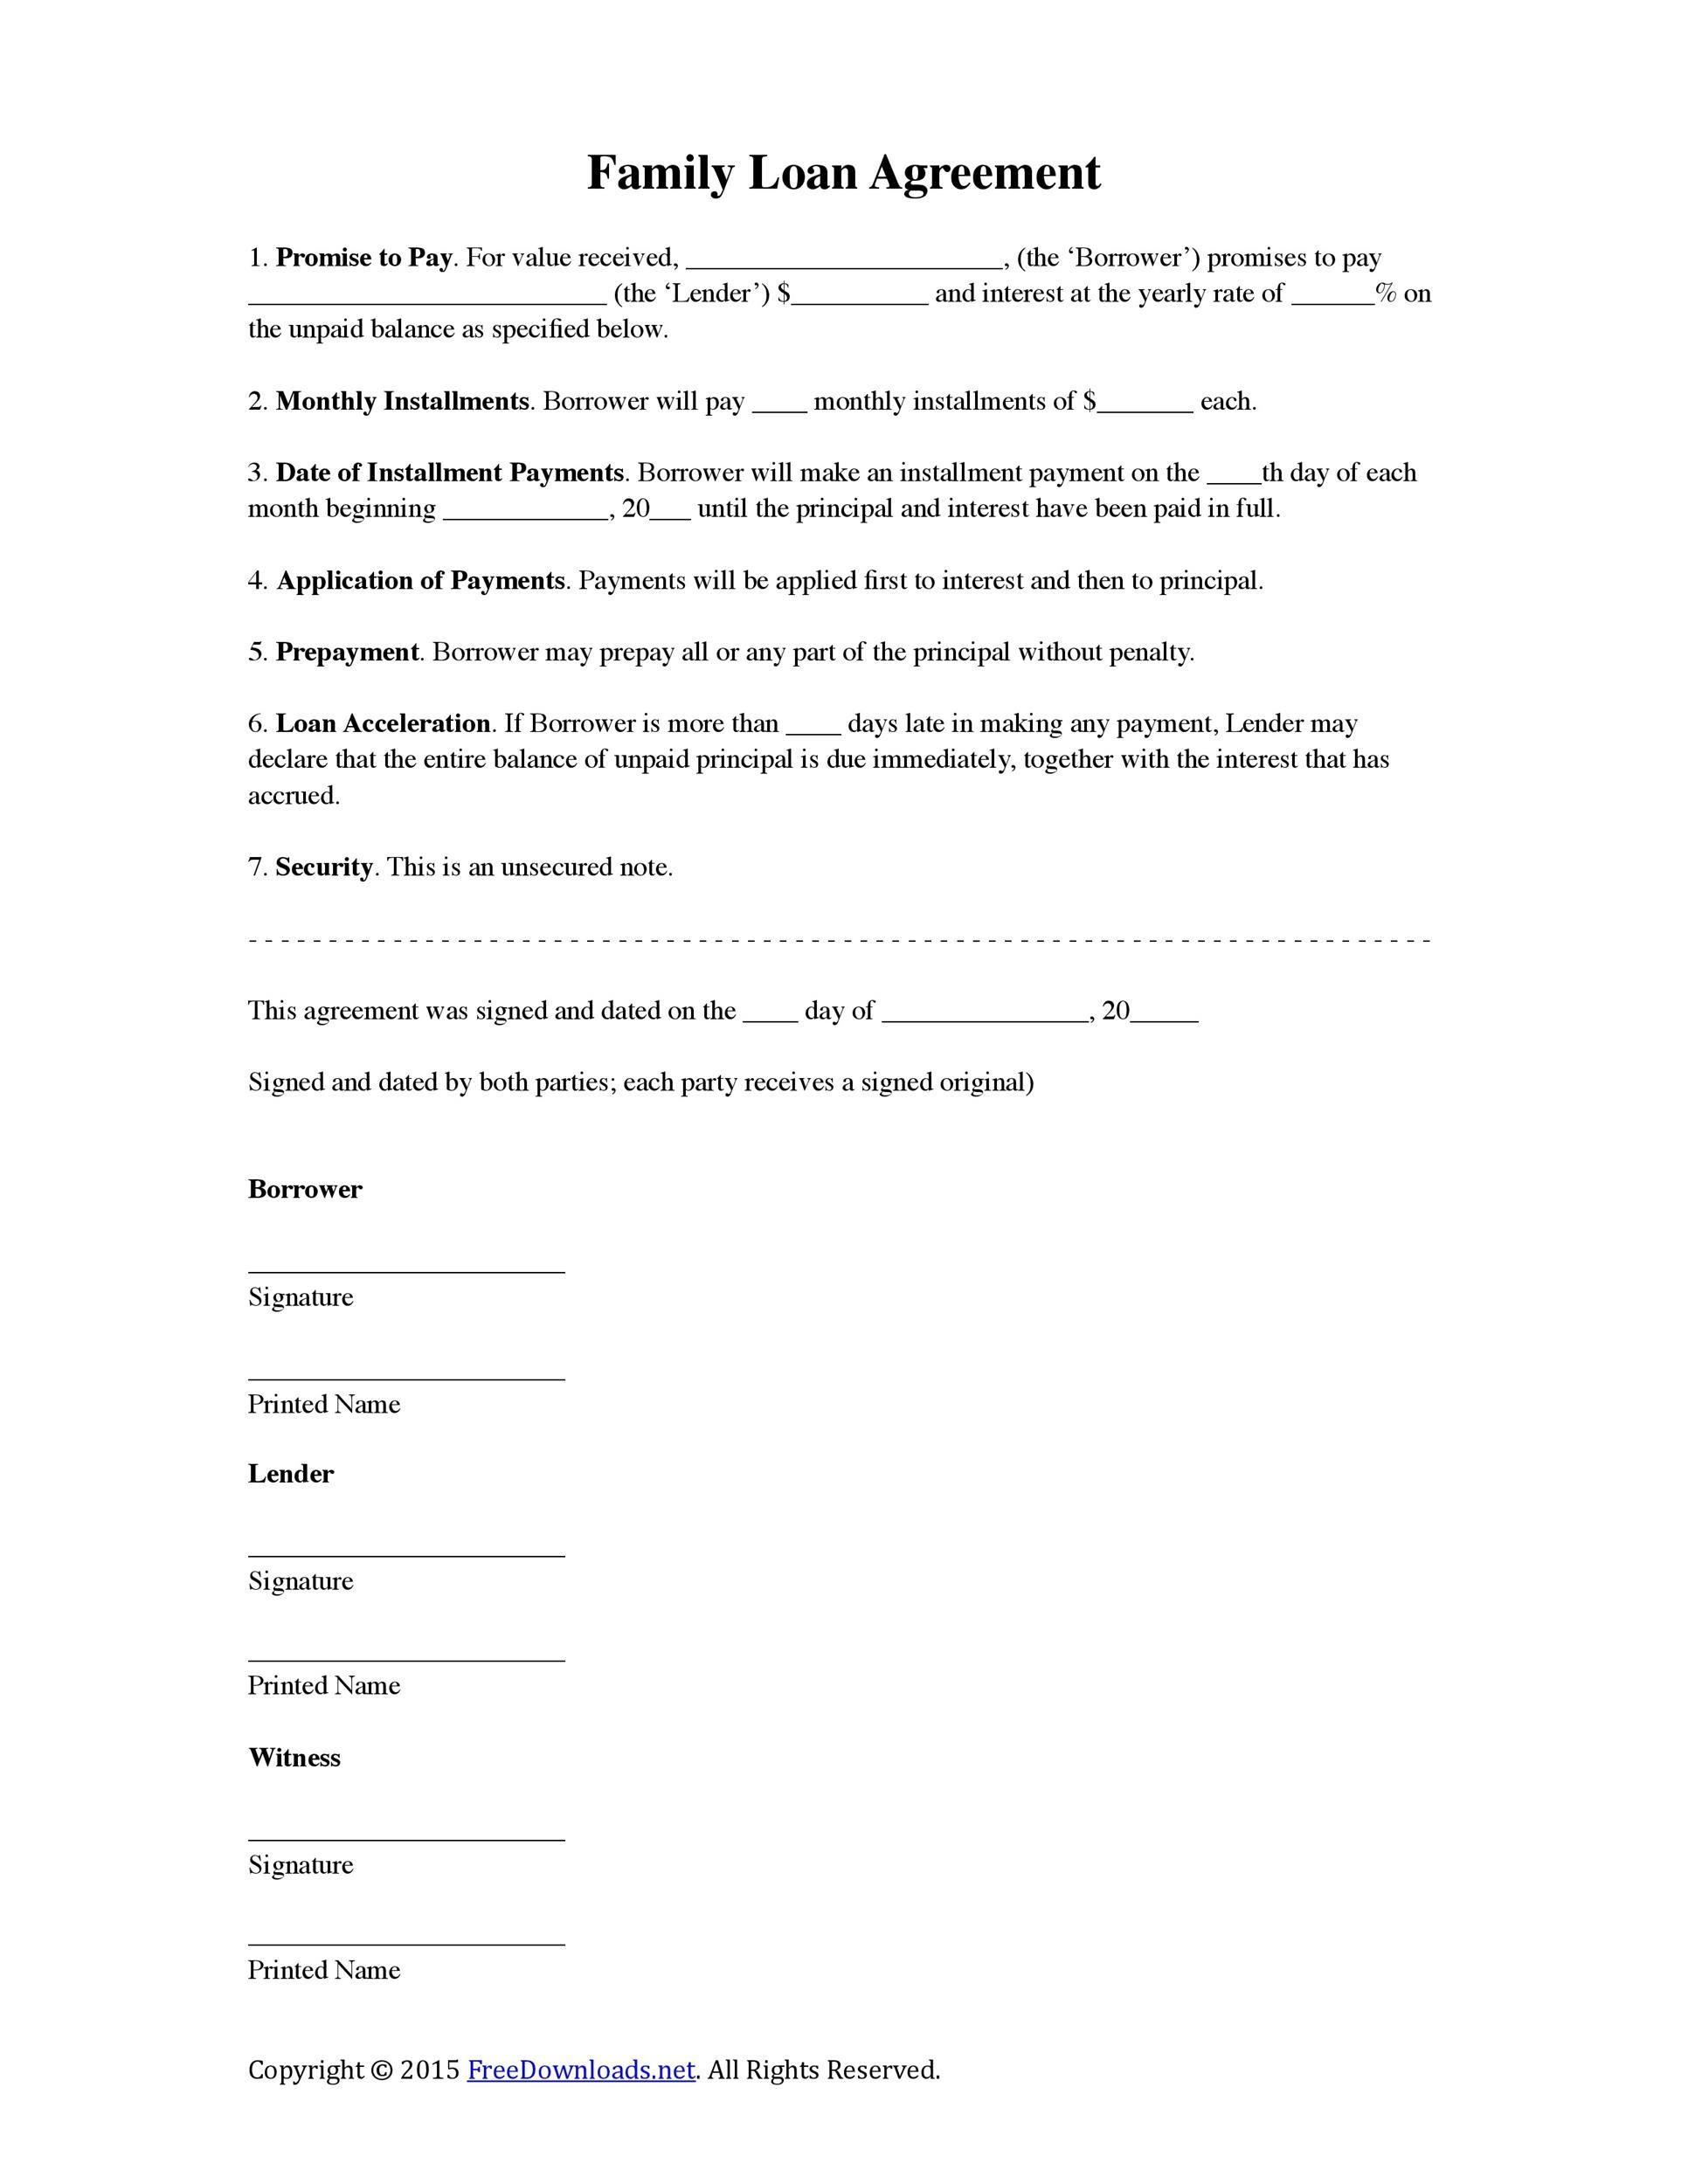 008 Impressive Family Loan Agreement Template Pdf Uk Image Full